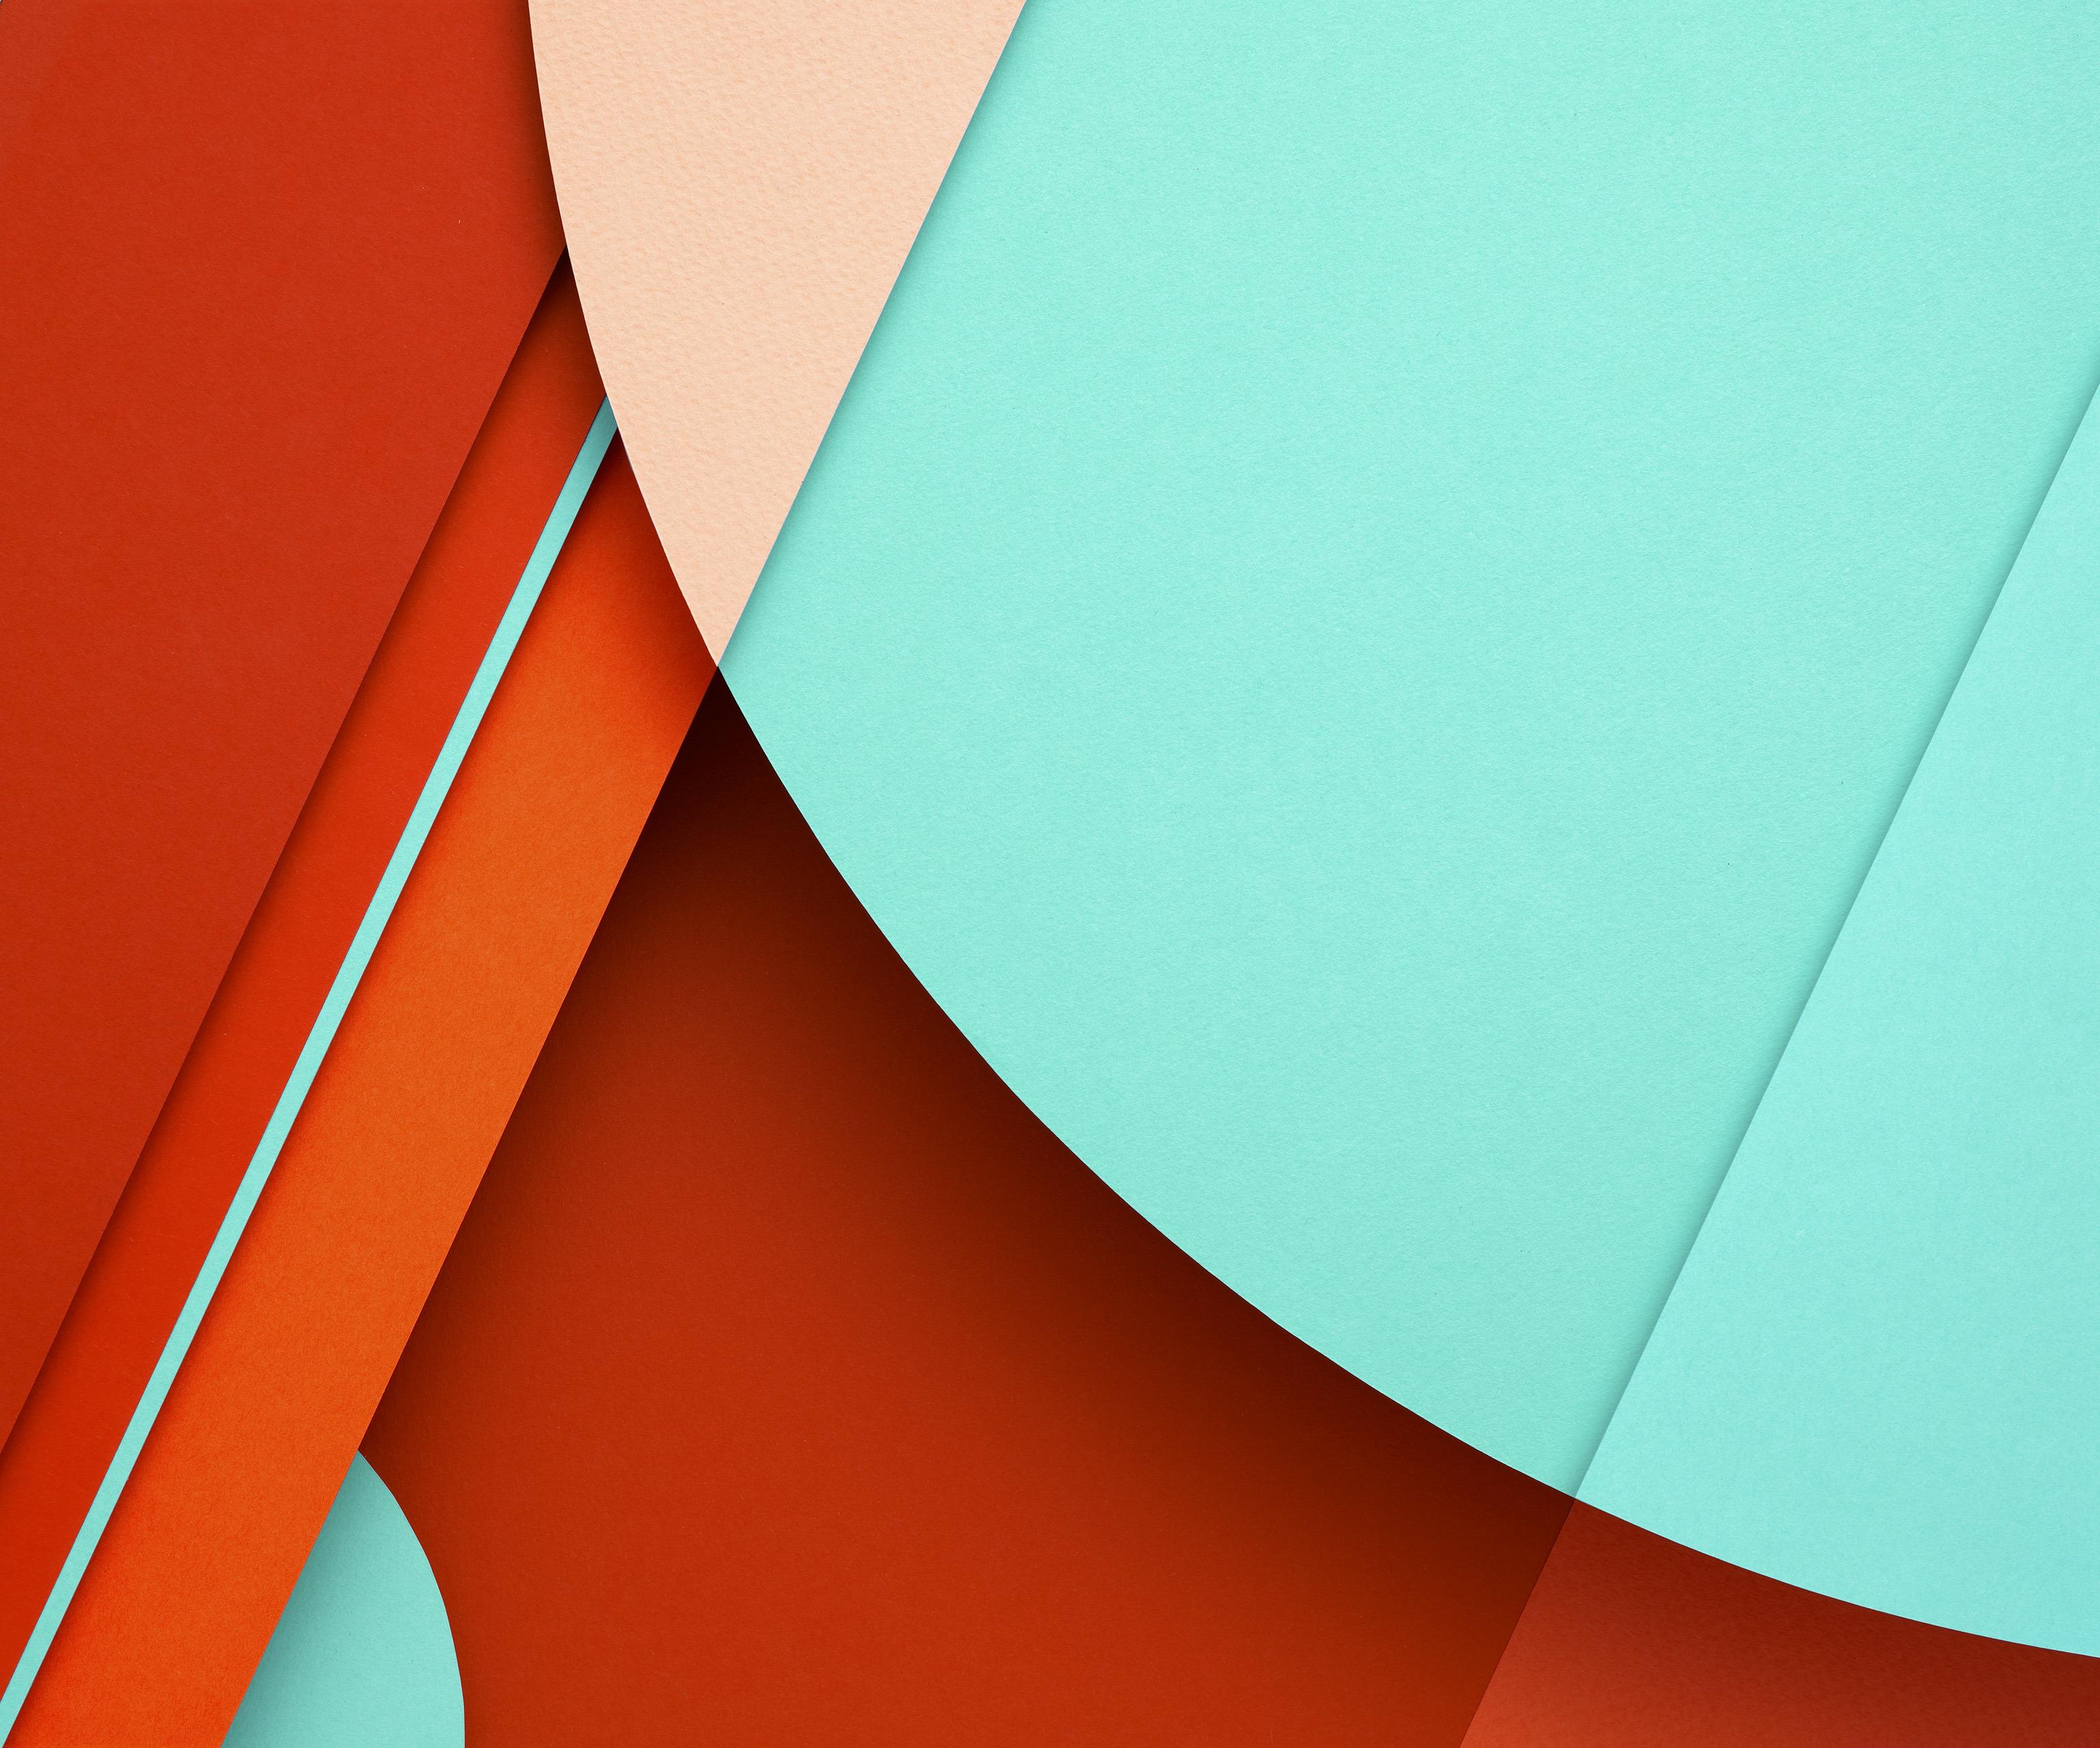 Nexus 6 Wallpapers, Nexus 6 Stock Wallpapers, Nexus 6 HD Wallpapers, HD Wallpapers for Nexus 6, Nexus 6 All stock wallpapers, Nexus Wallpapers for Android, Nexus 6 HD Wallpapers, HD Nexus 6 Wallpapers, Nexus 6 2560 x 2683 wallpapers, Nexus 6 2K Wallpapers, All HD Nexus 6 Wallpapers, Nexus 6 ringtones, Nexus 6 sounds, Nexus 6 stock ringtones